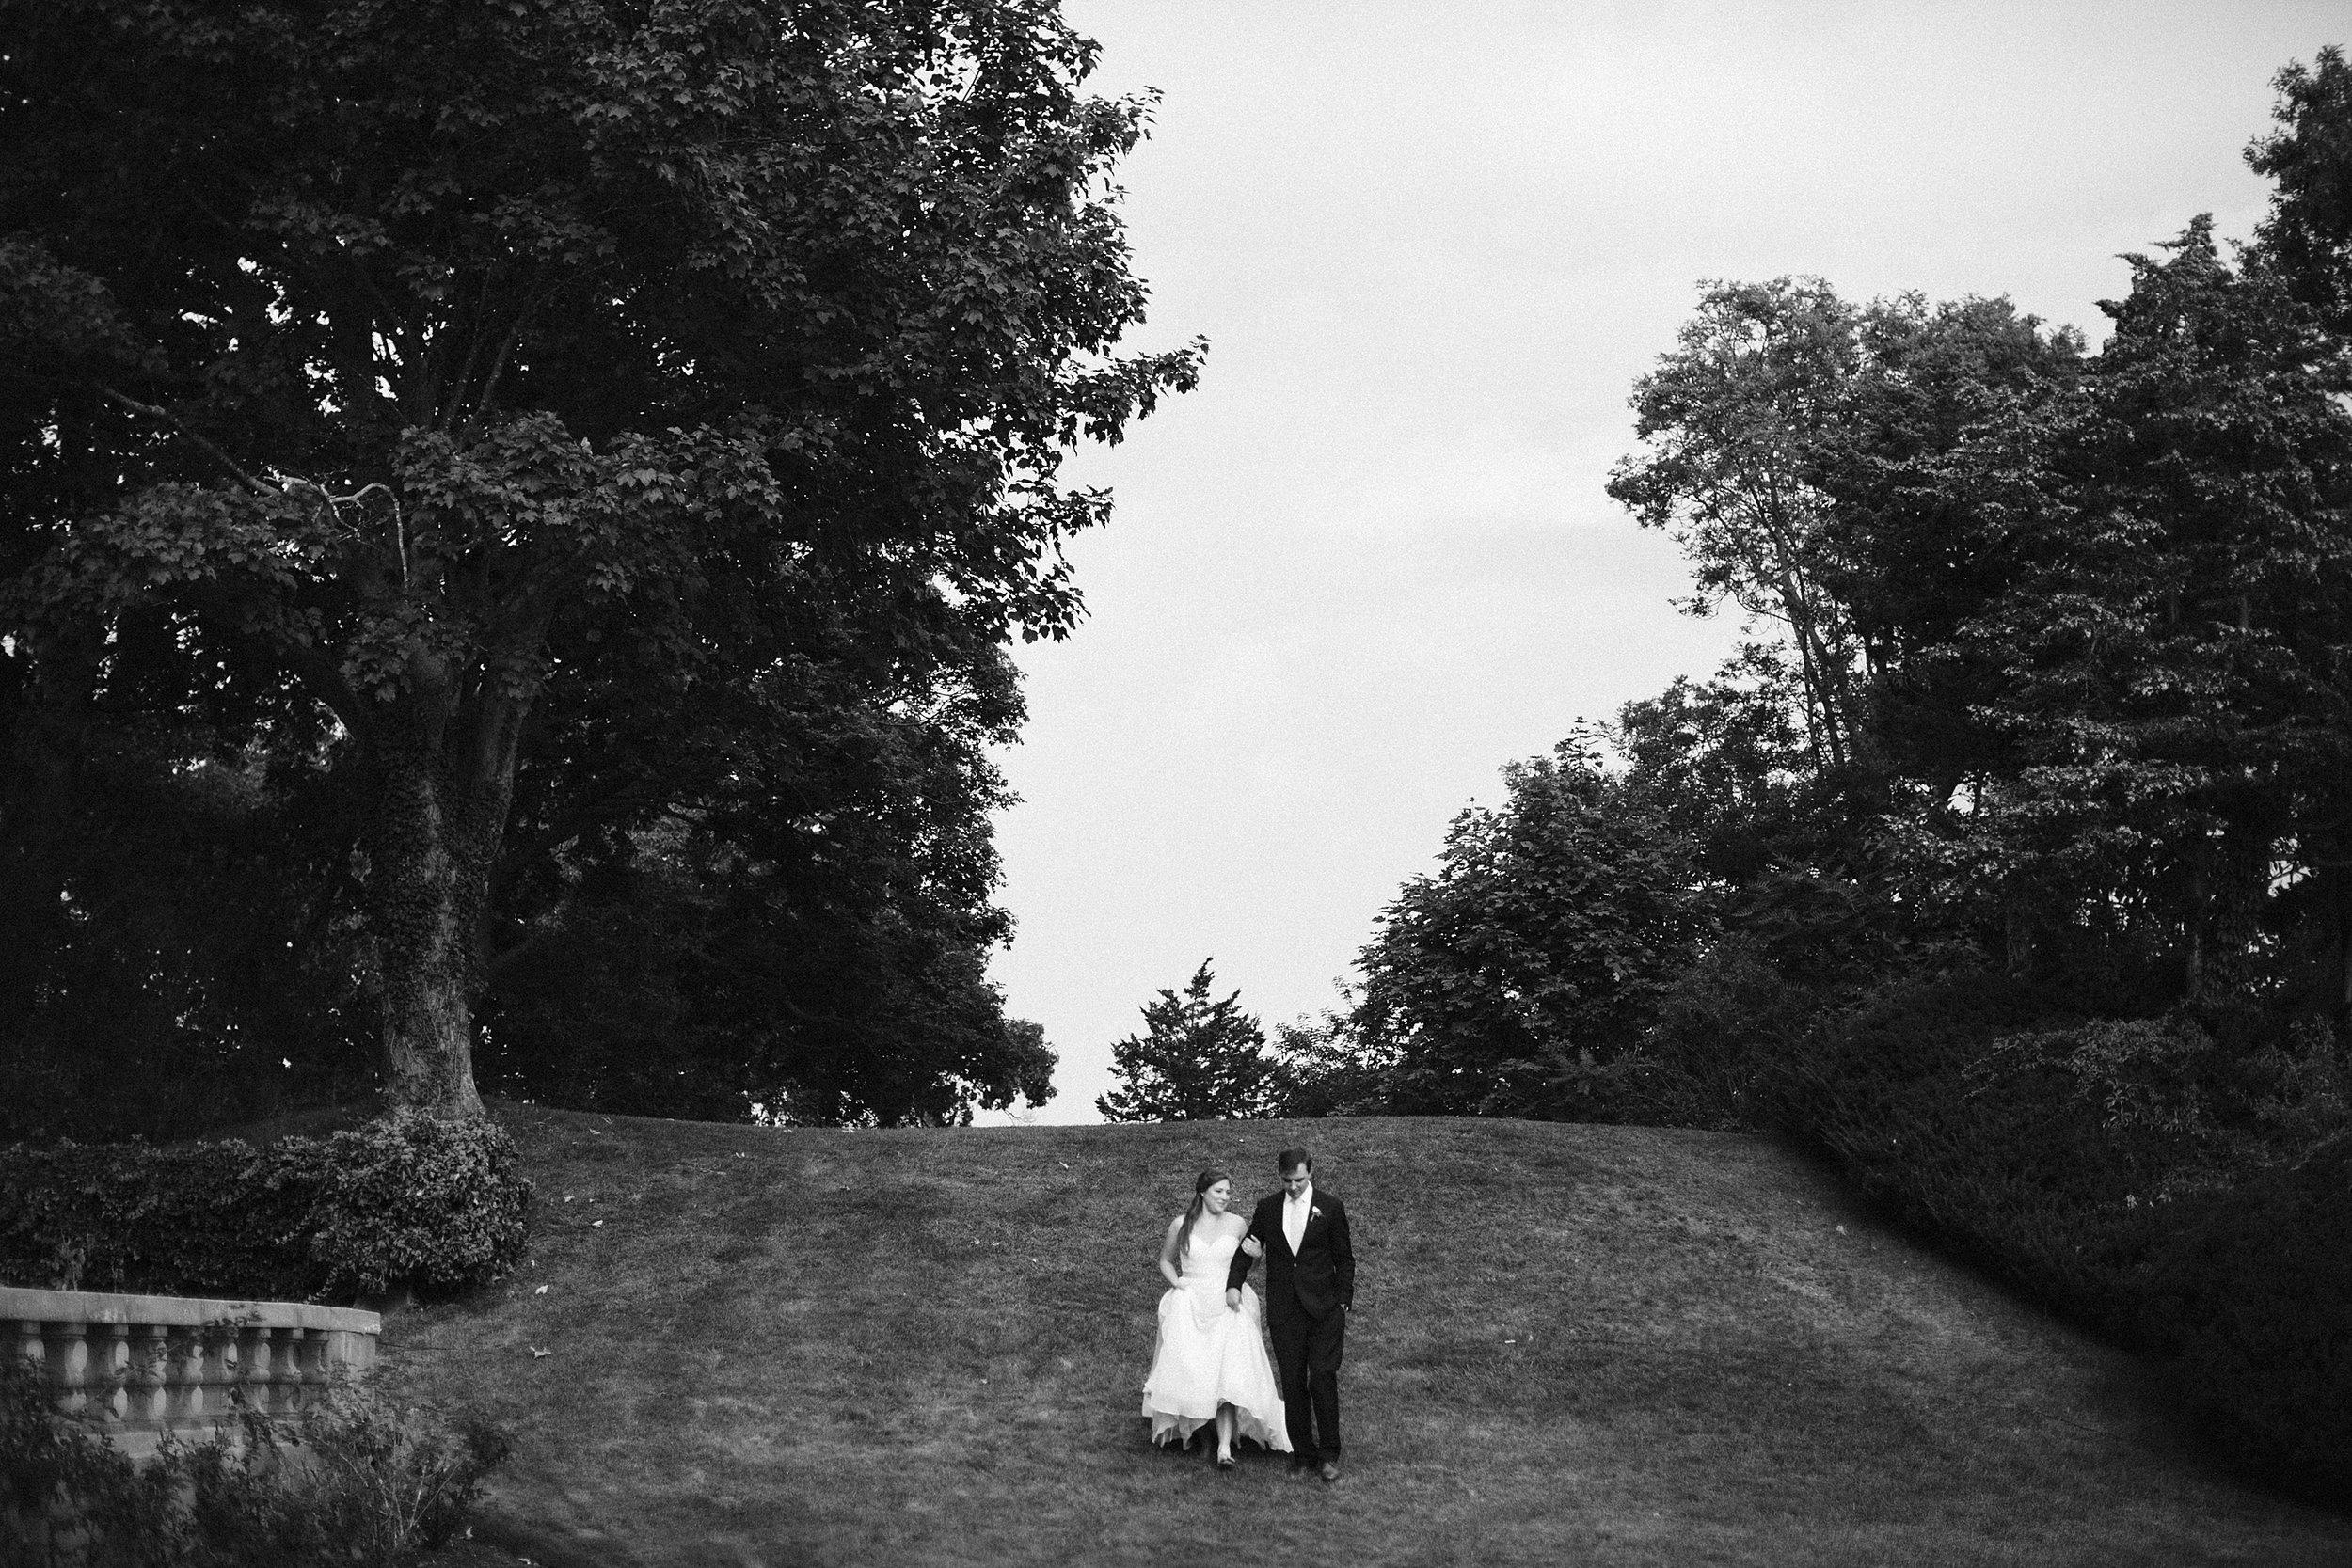 015 los angeles wedding photographer todd danforth photography boston.jpg